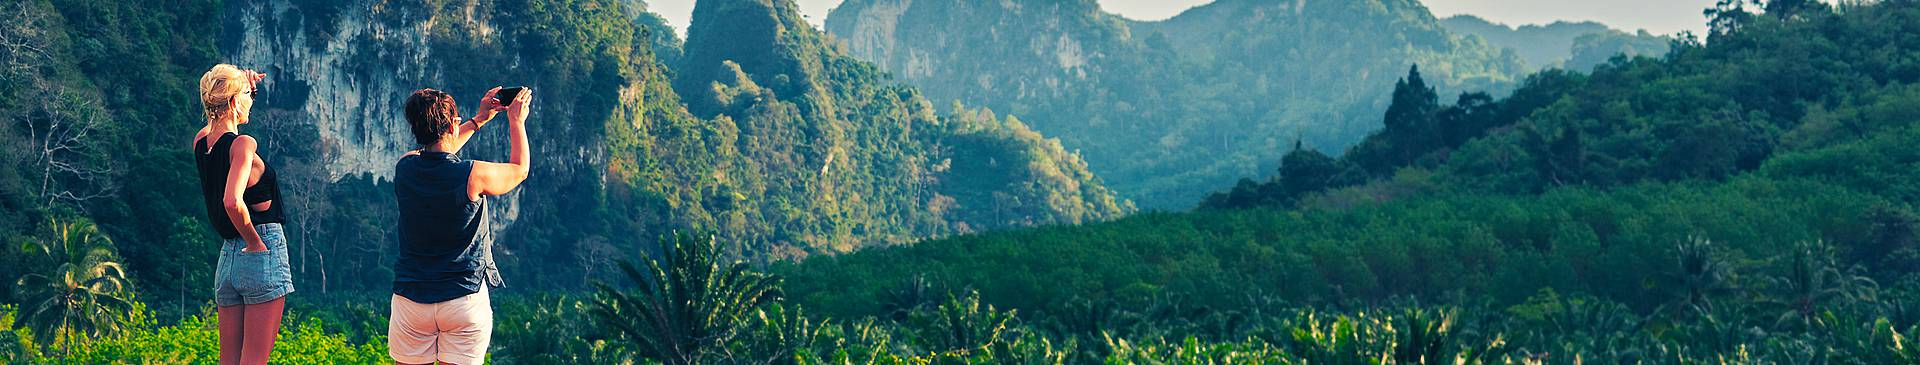 Thailand Honeymoon Vacations